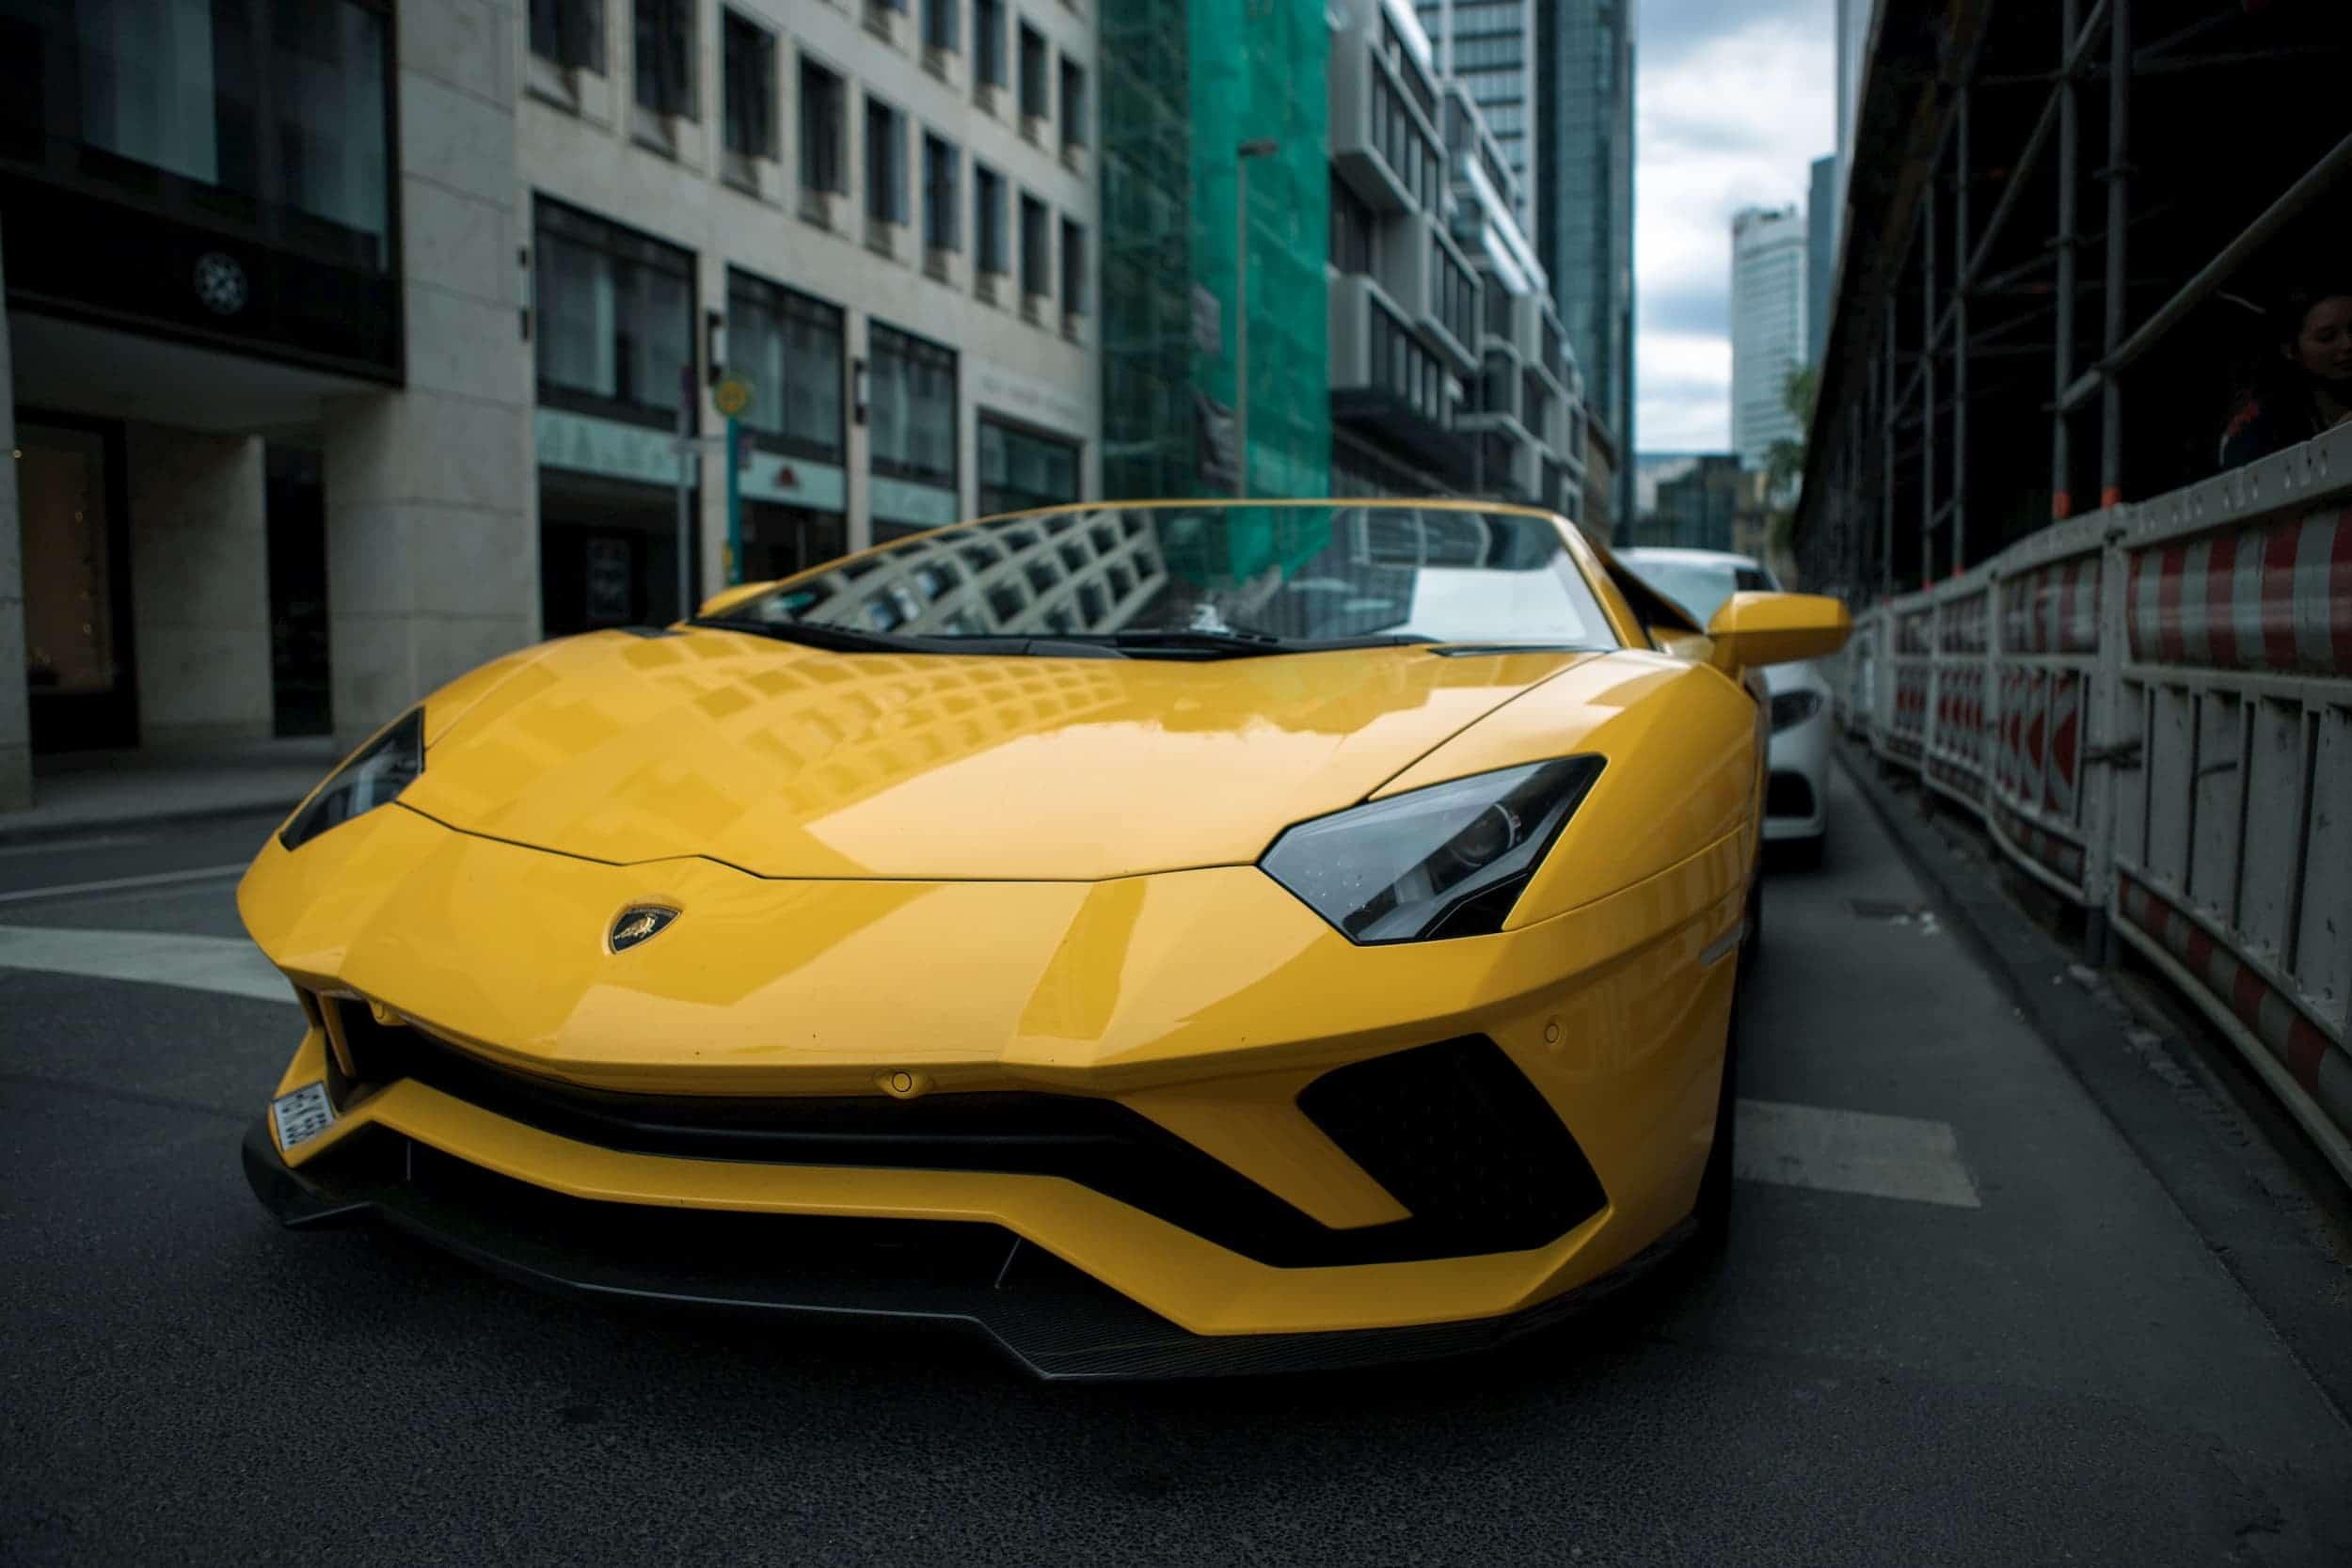 Yellow Lamborghini: Money Saving Goals